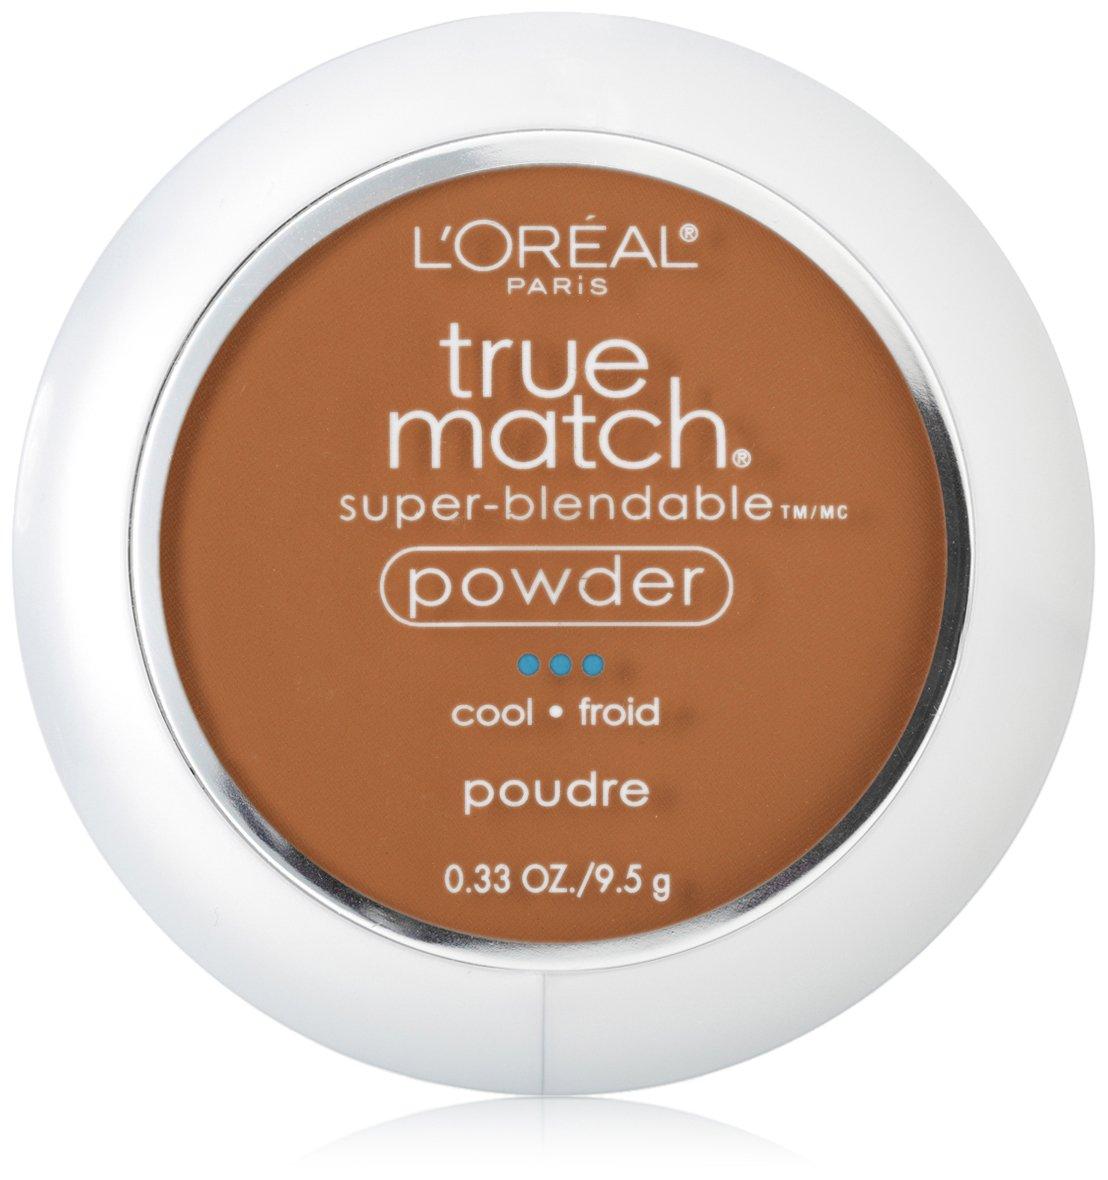 L'Oréal Paris True Match Super-Blendable Powder, Cocoa, 0.33 oz.